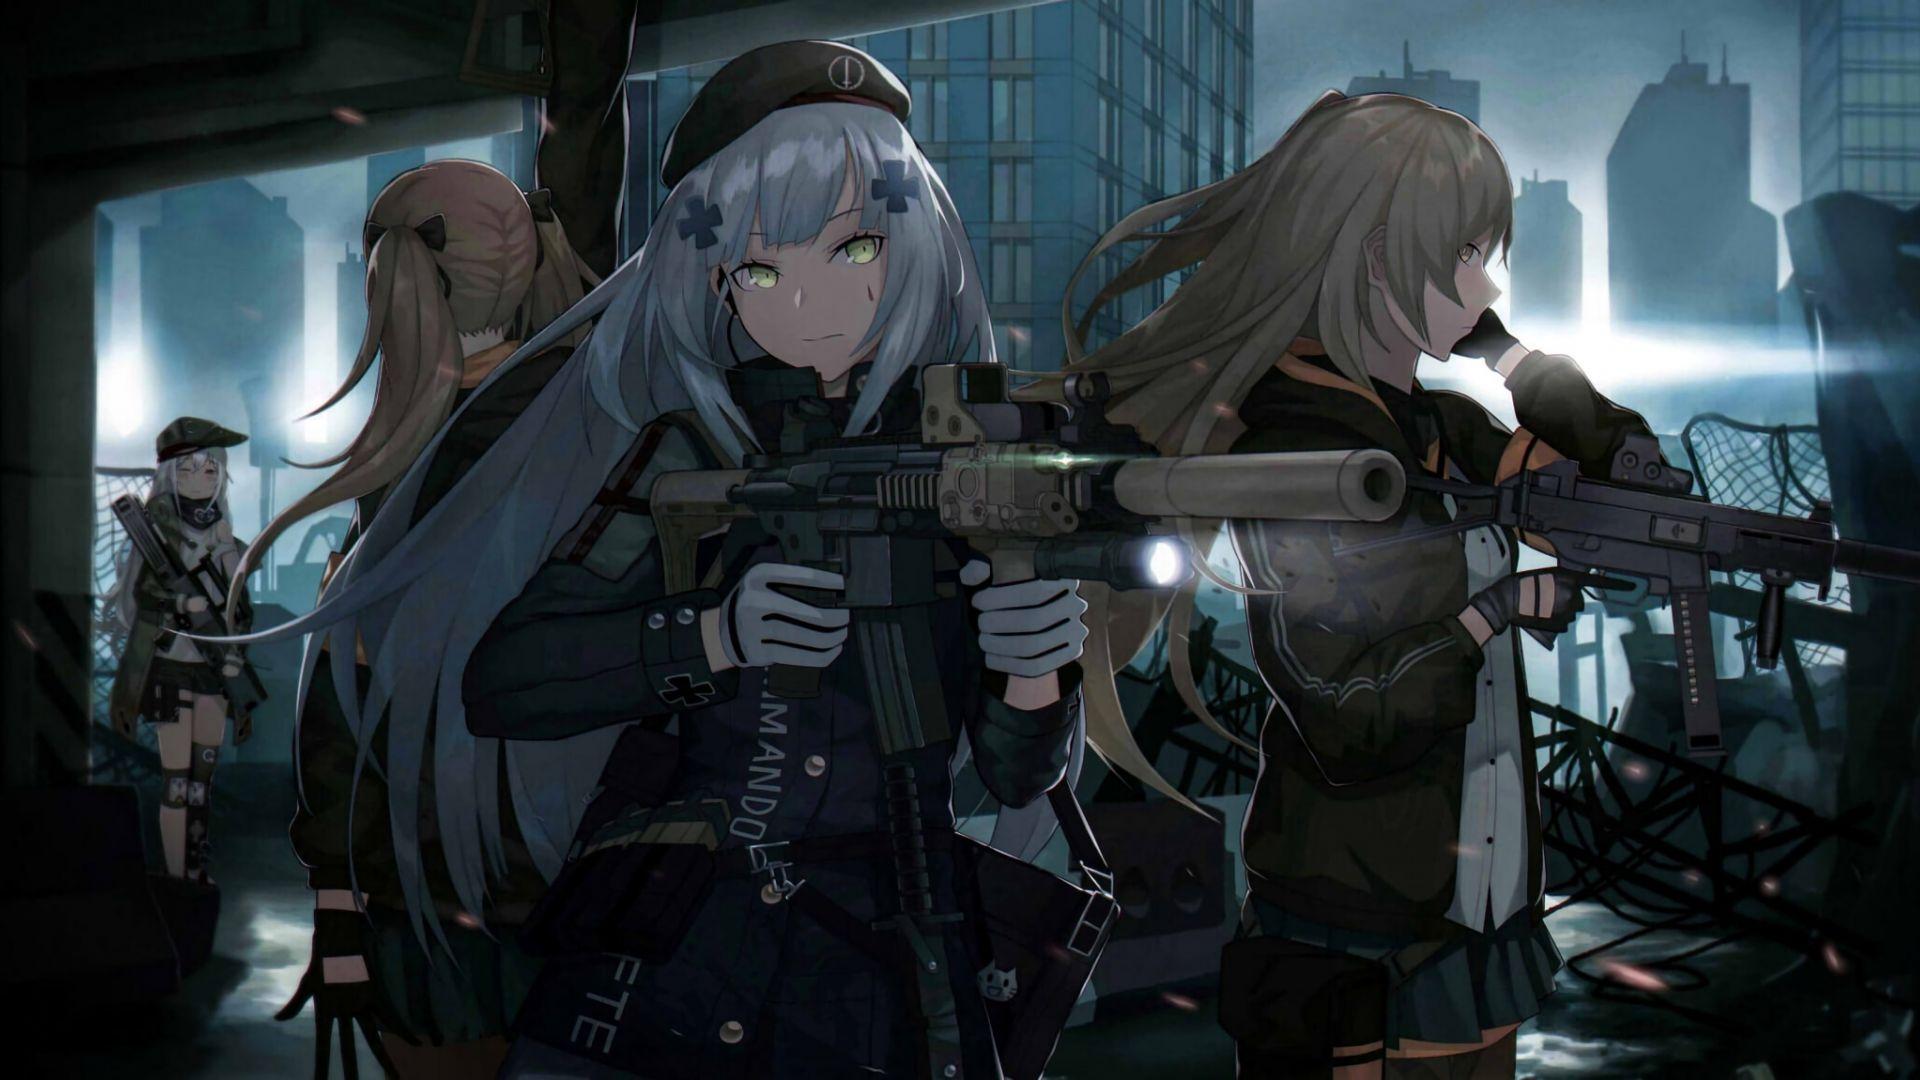 Boy Girl Wallpapers Desktop Desktop Wallpaper Girls Frontline Anime Girls With Gun